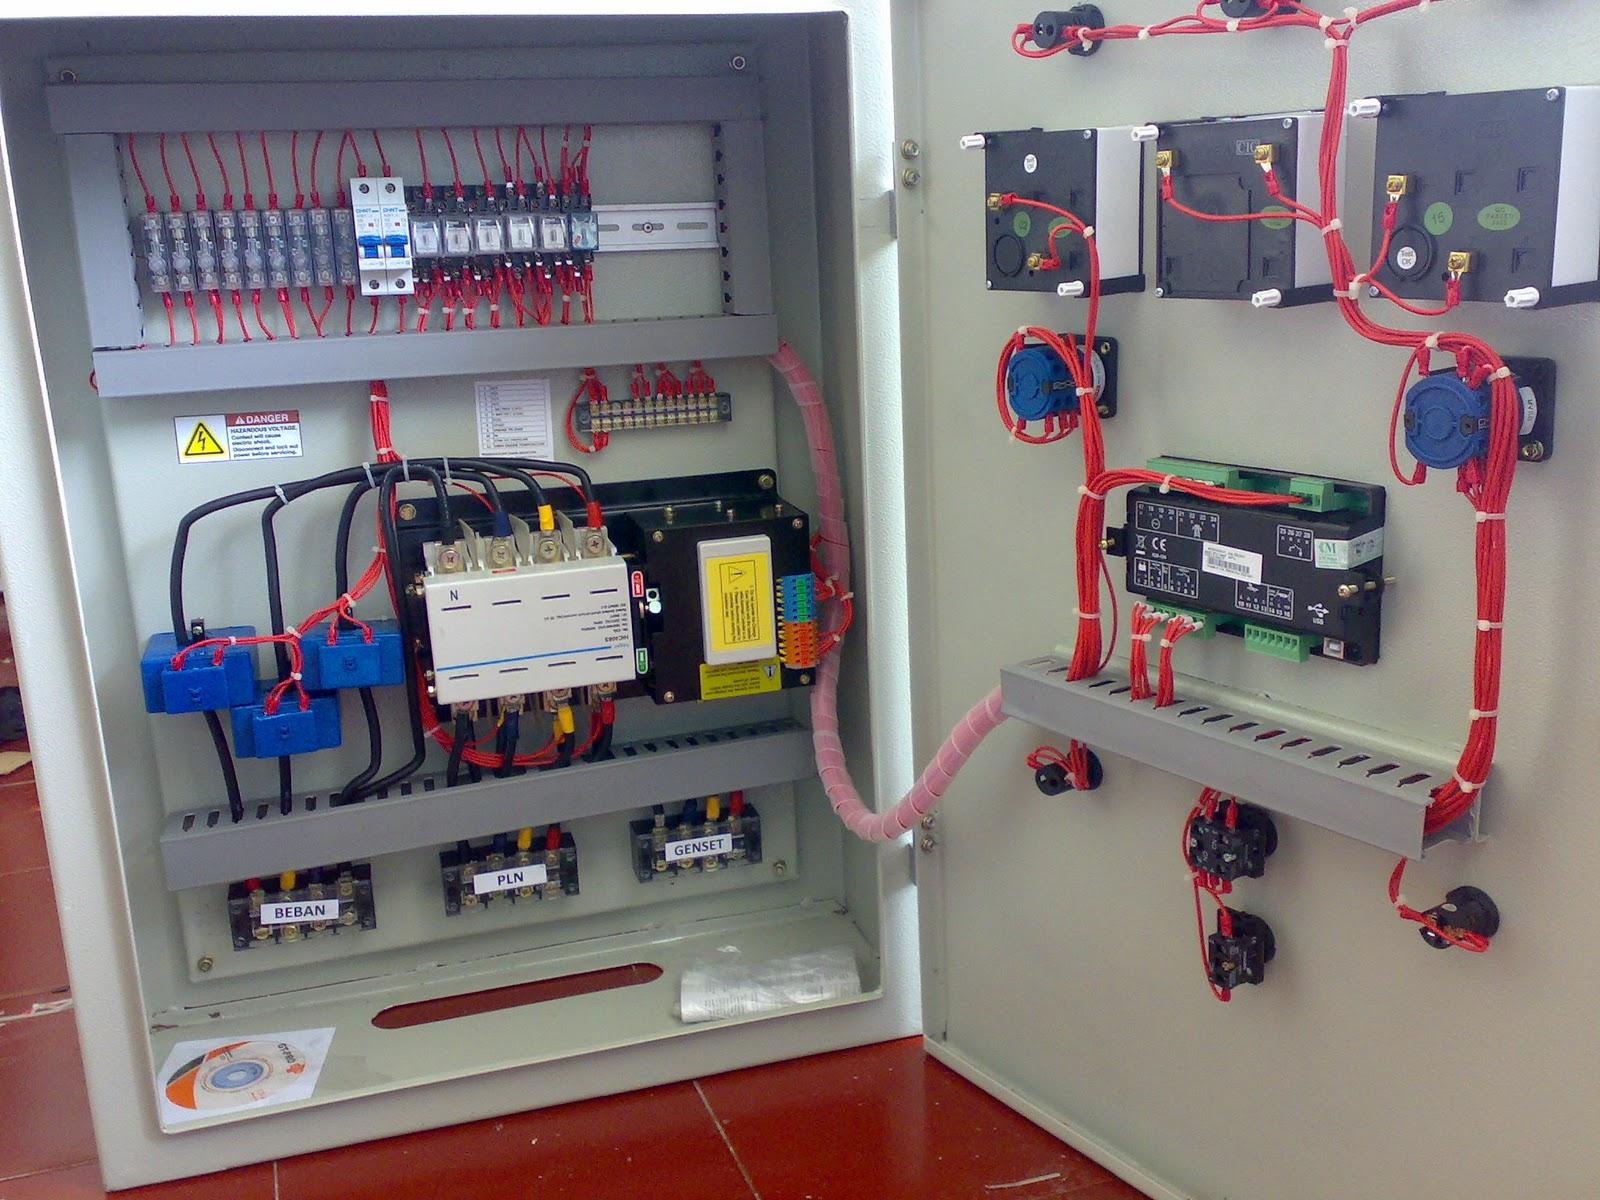 hight resolution of caturindo prima engineering jual panel ats amf rh caturindo pe blogspot com control panel wiring